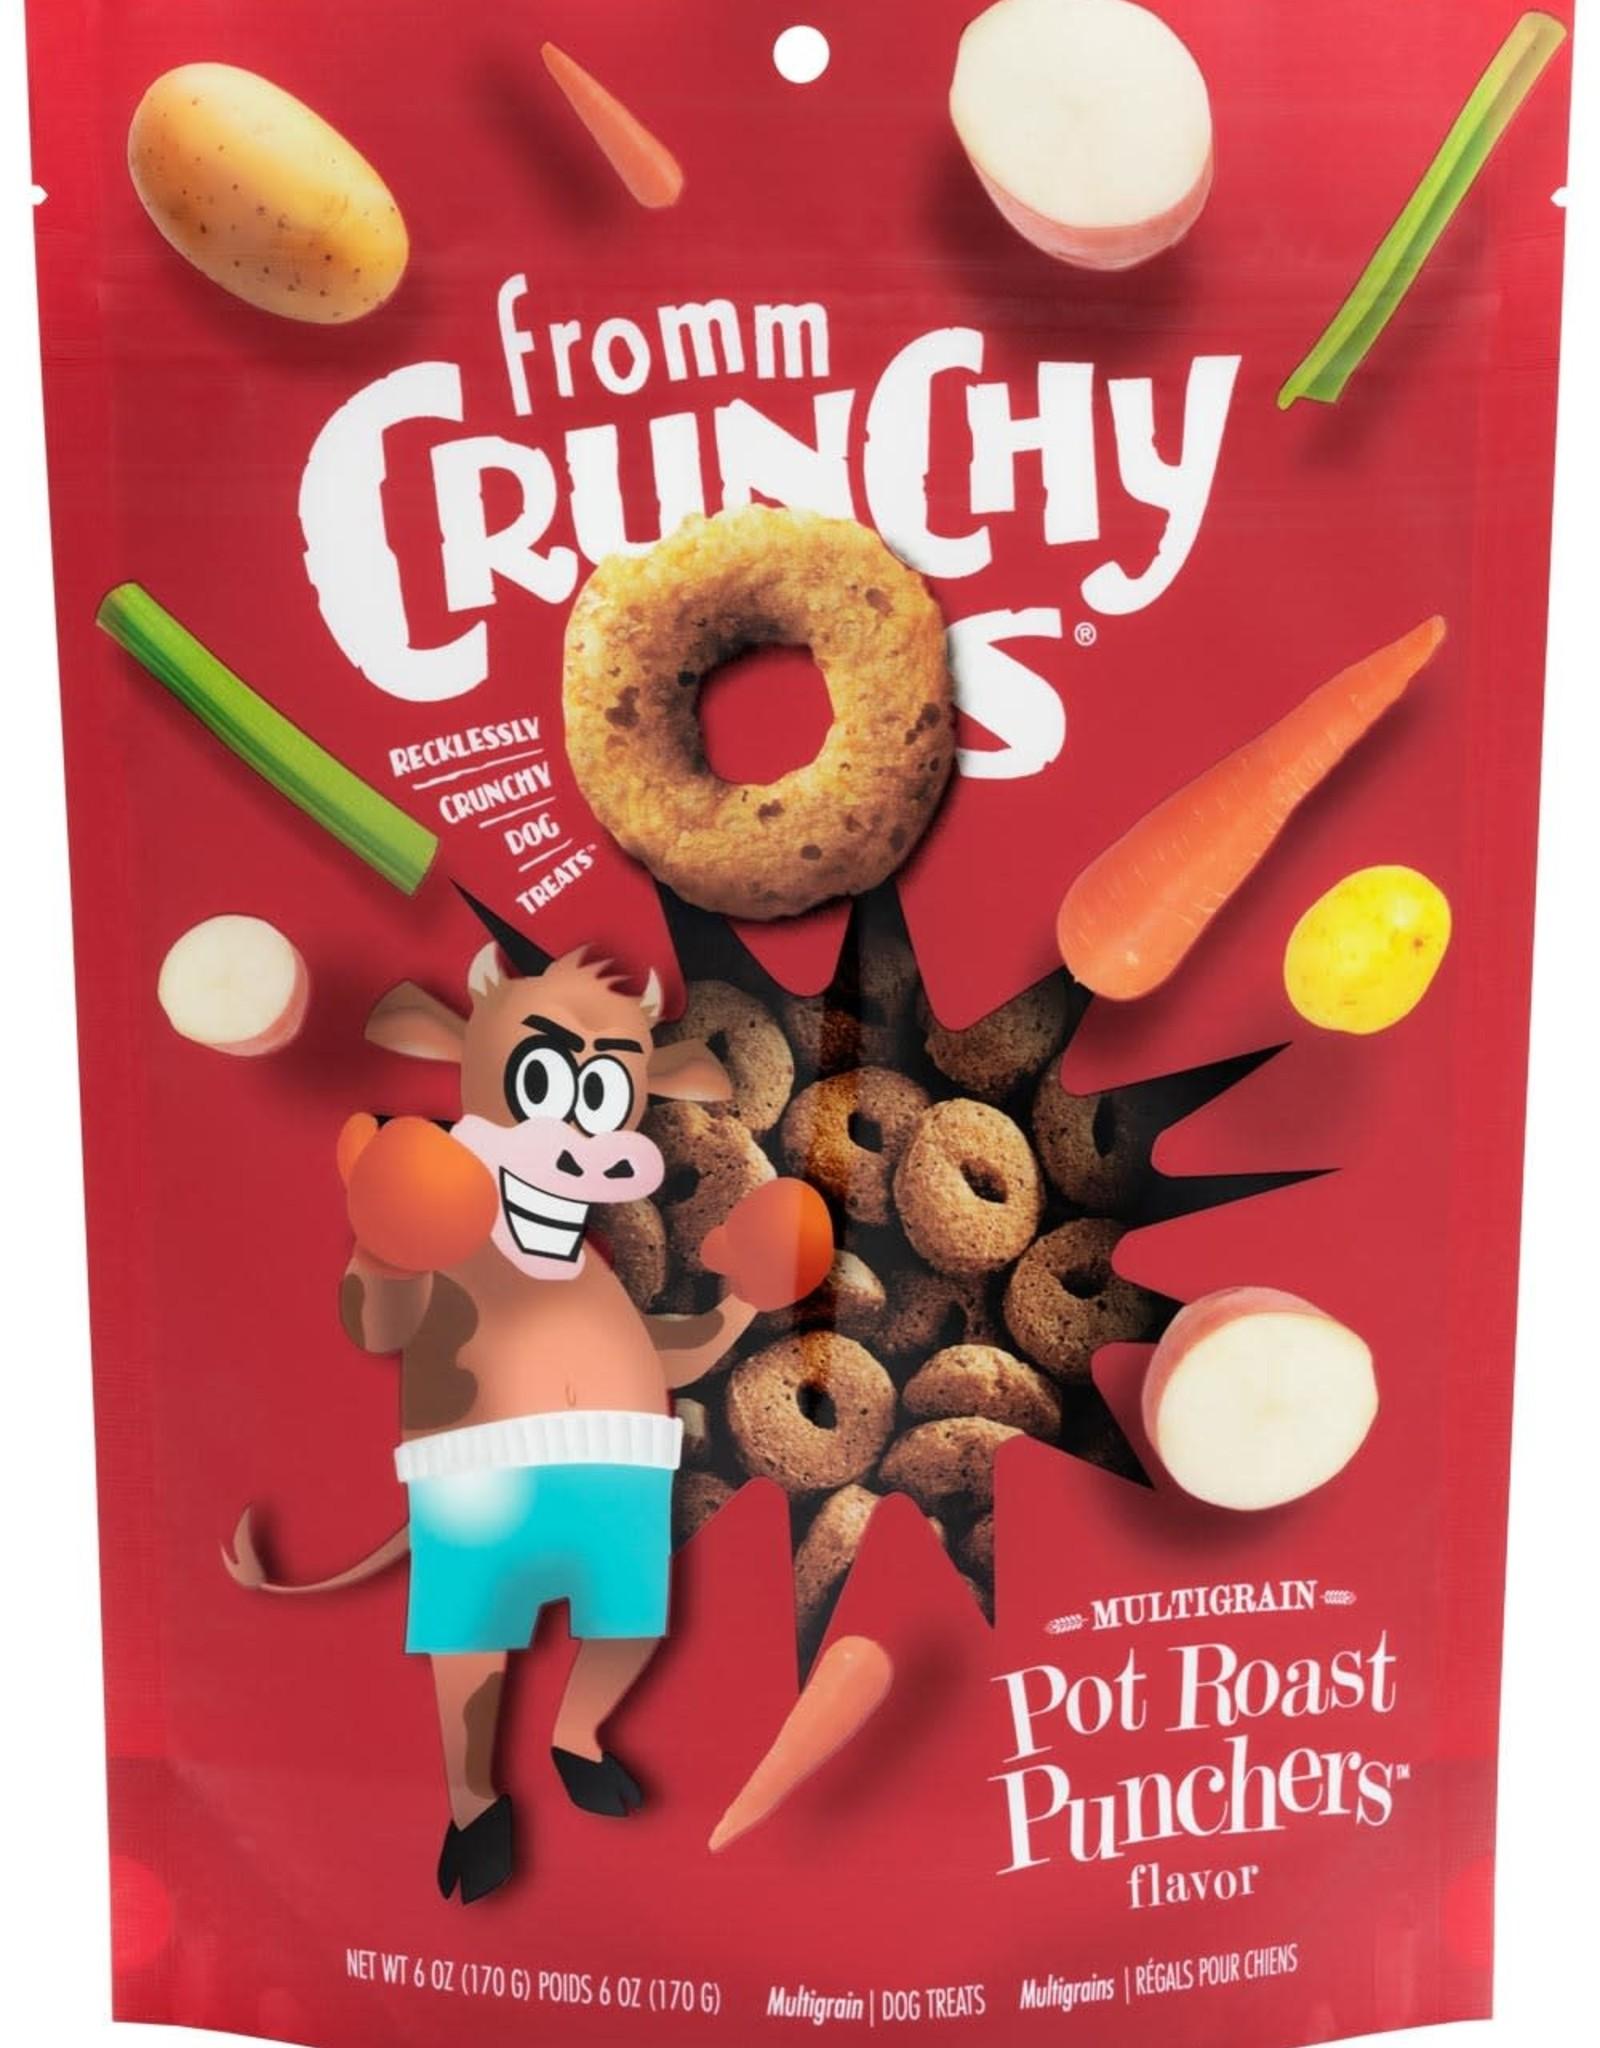 Fromm Dog Crunchy Os Pot Roast Punchers Treats 6 oz